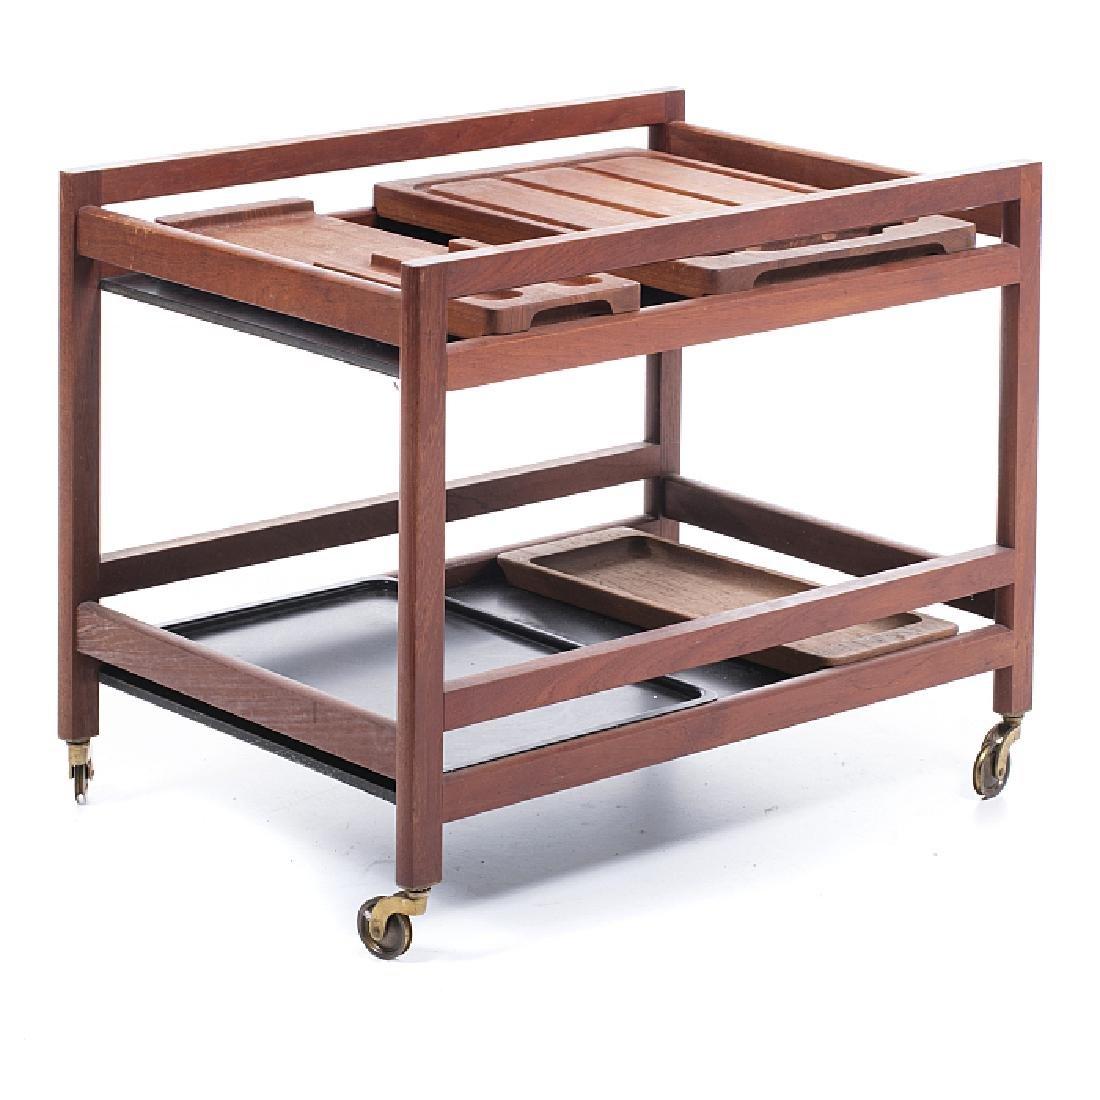 Modernist serving cart